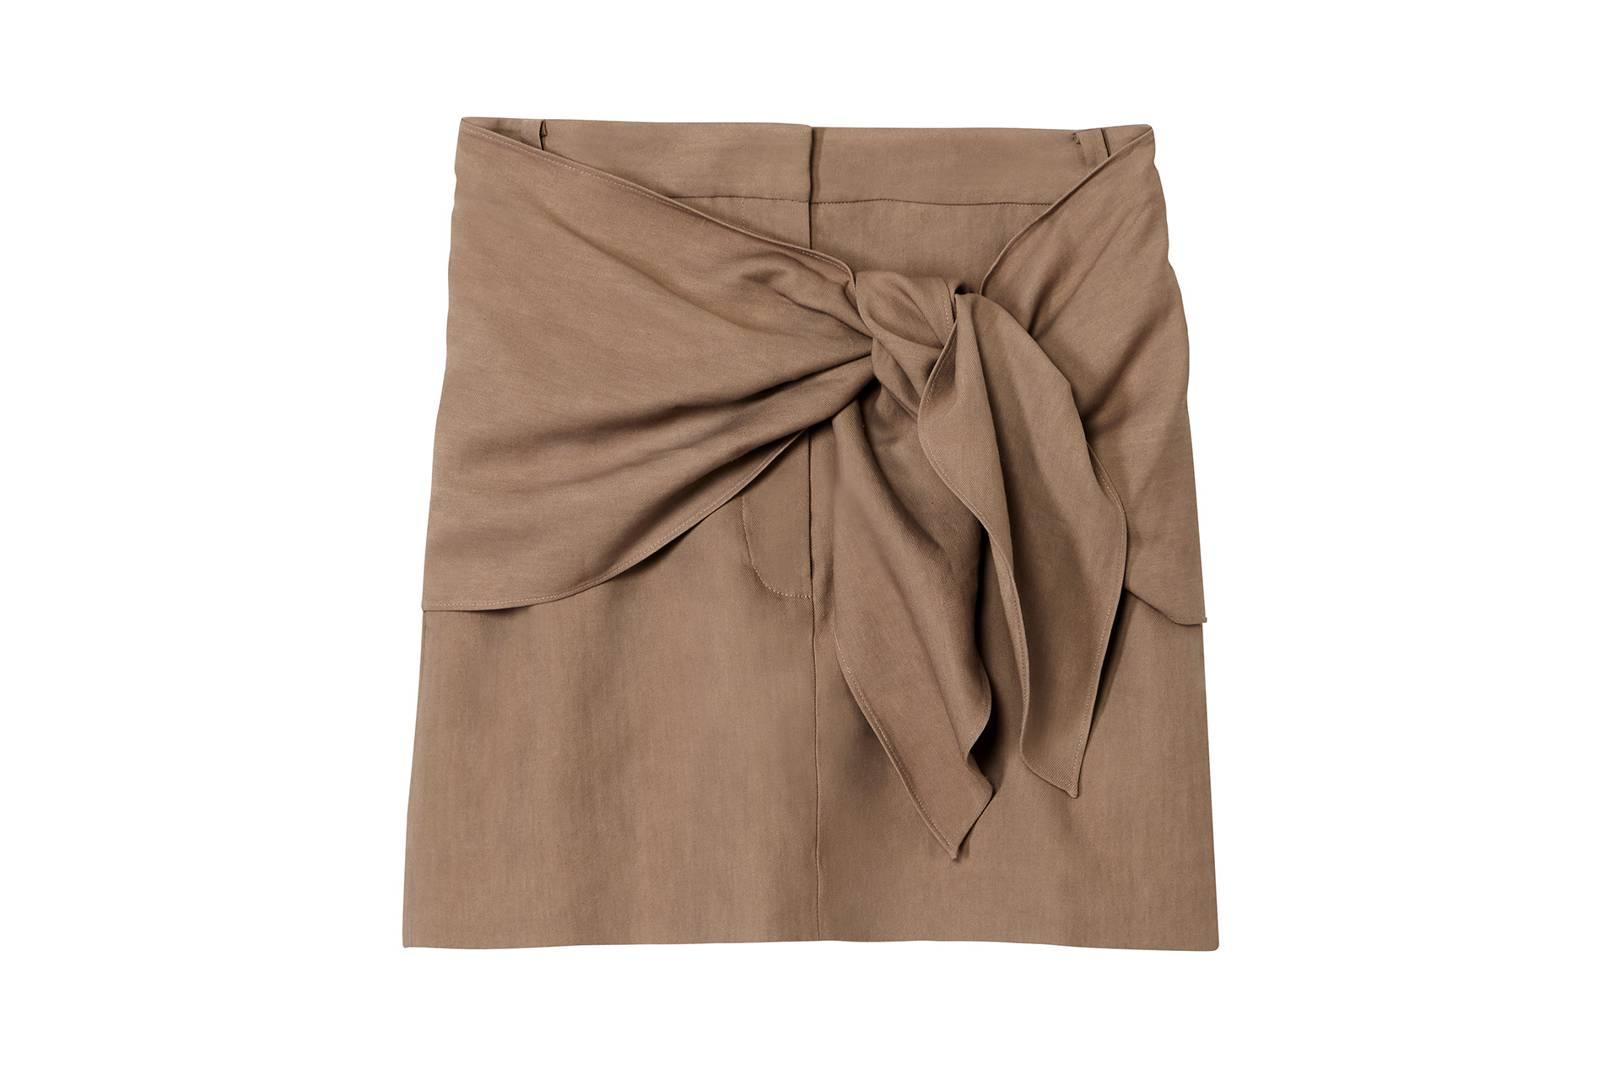 e90fa64bf009 Why The Mini Skirt Is Back On The Fashion Agenda | British Vogue